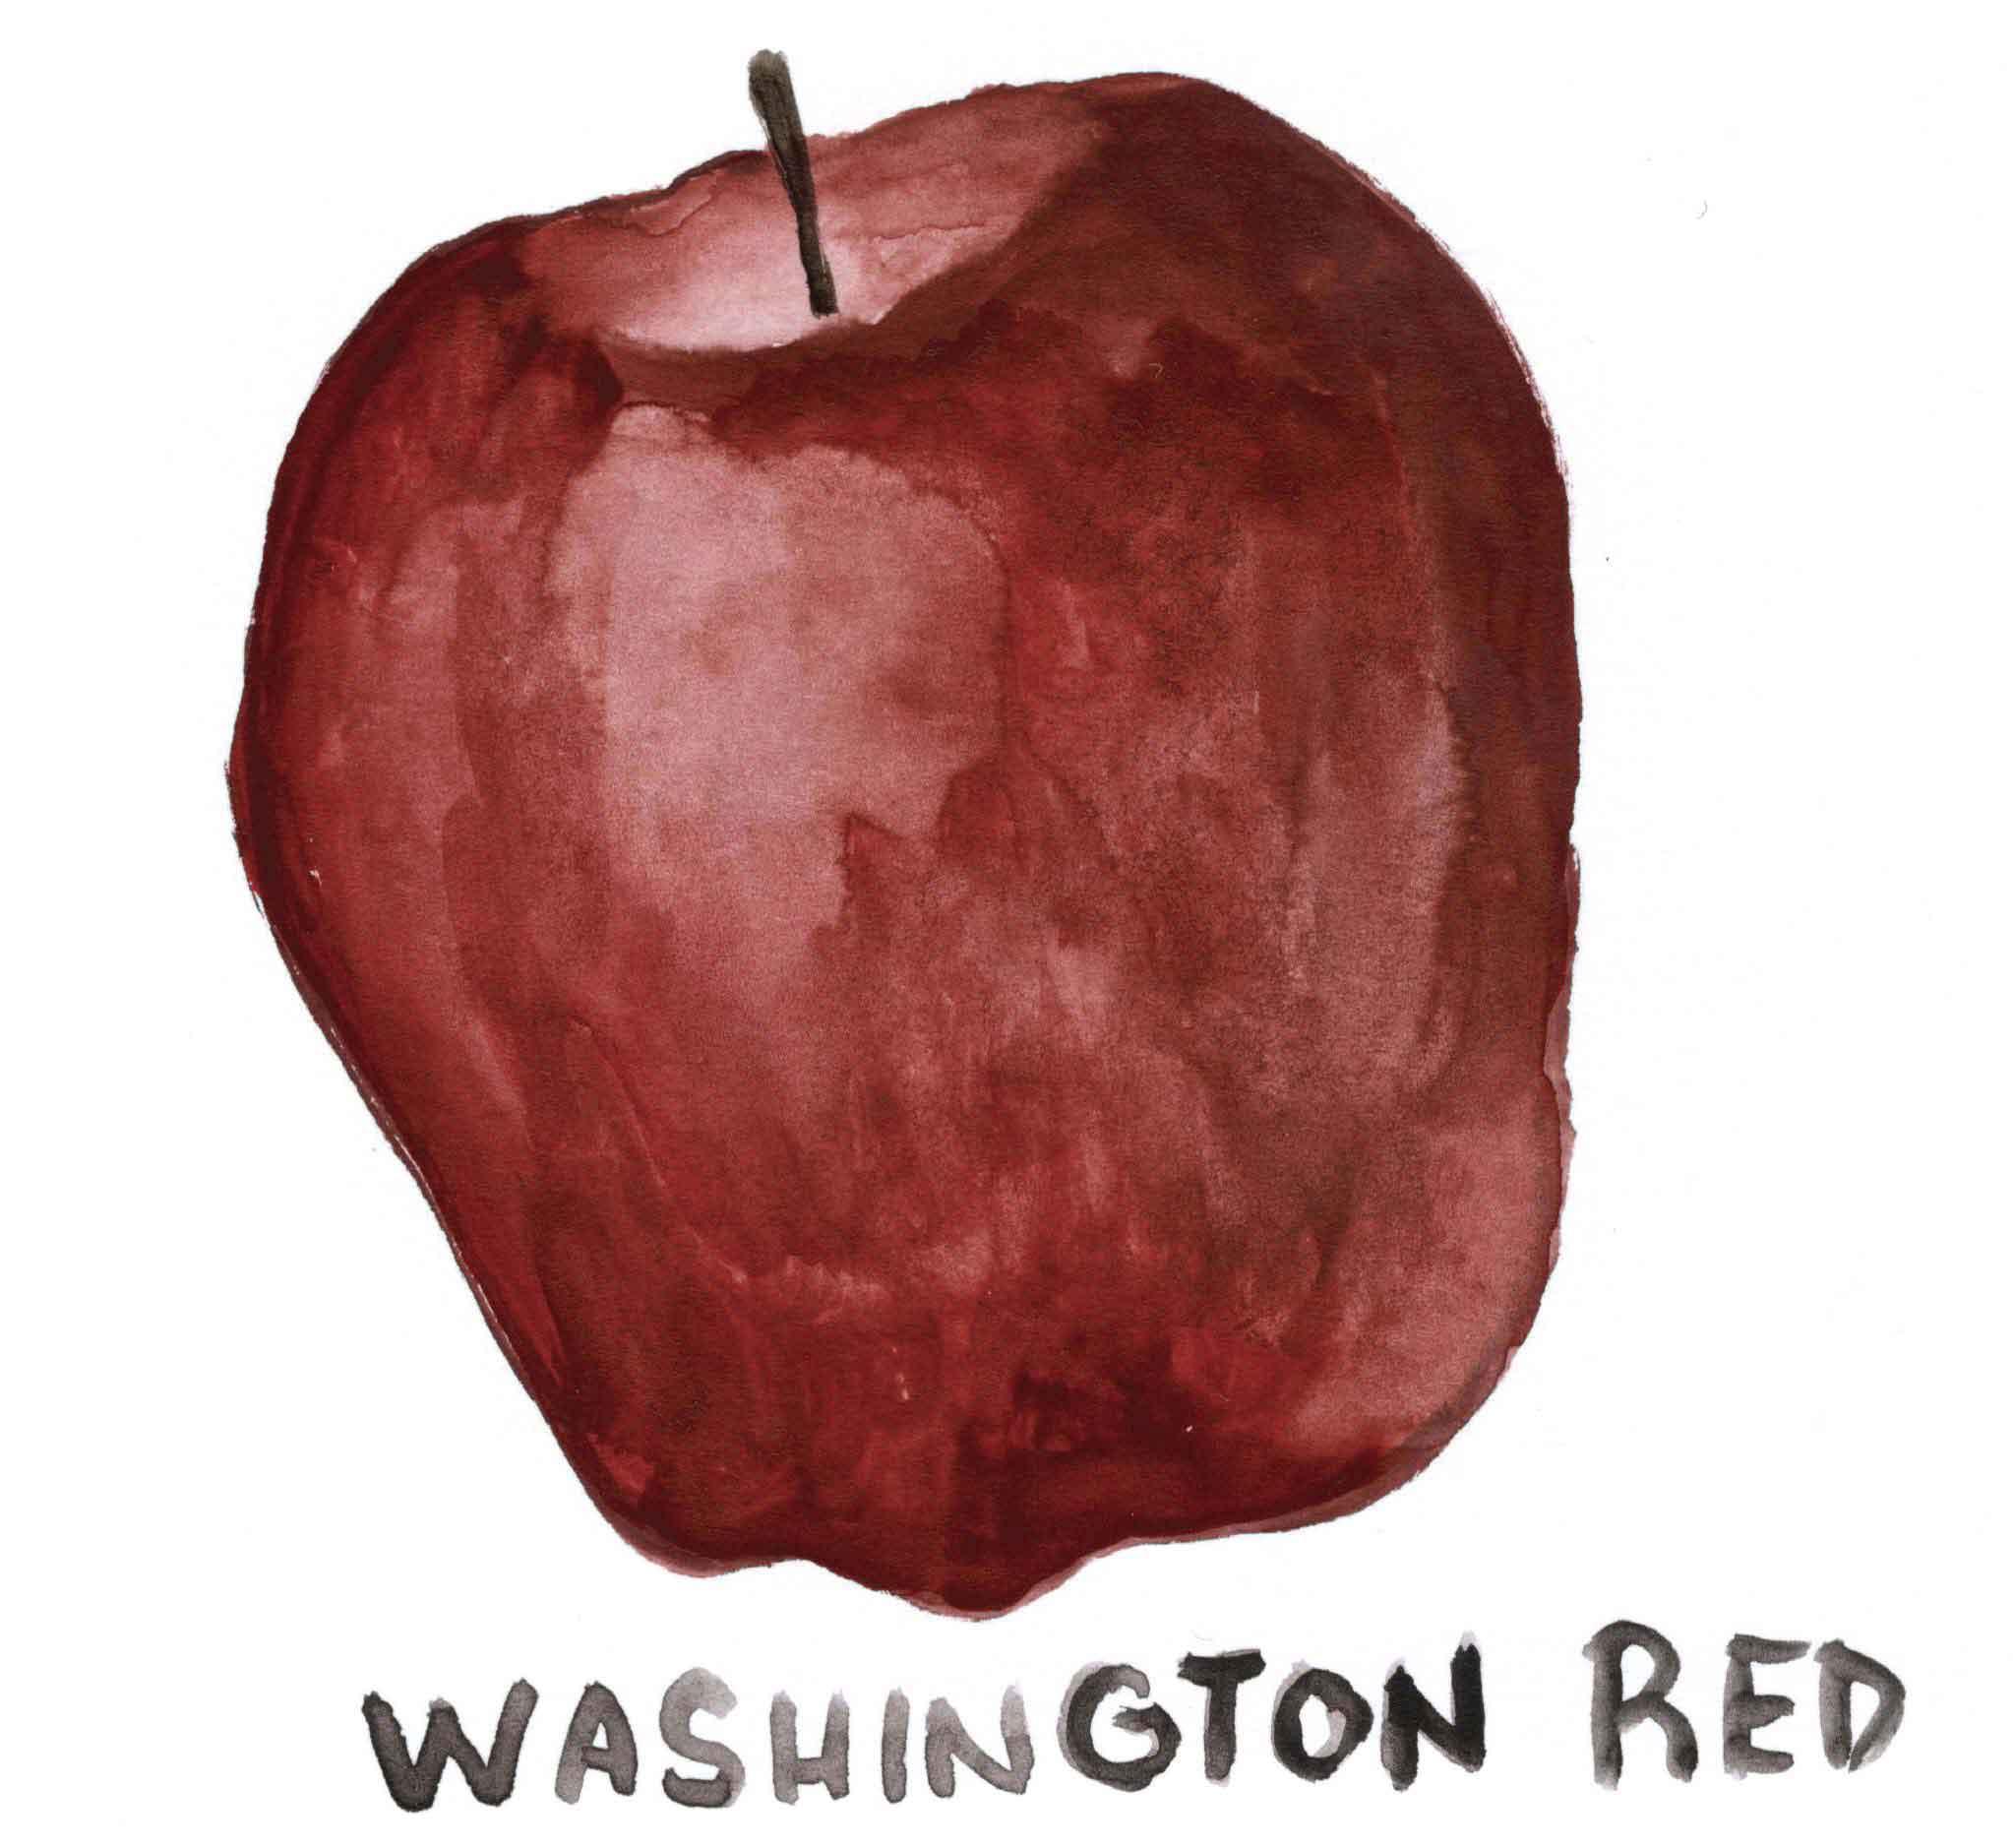 manzana-washington-red-ilustracion